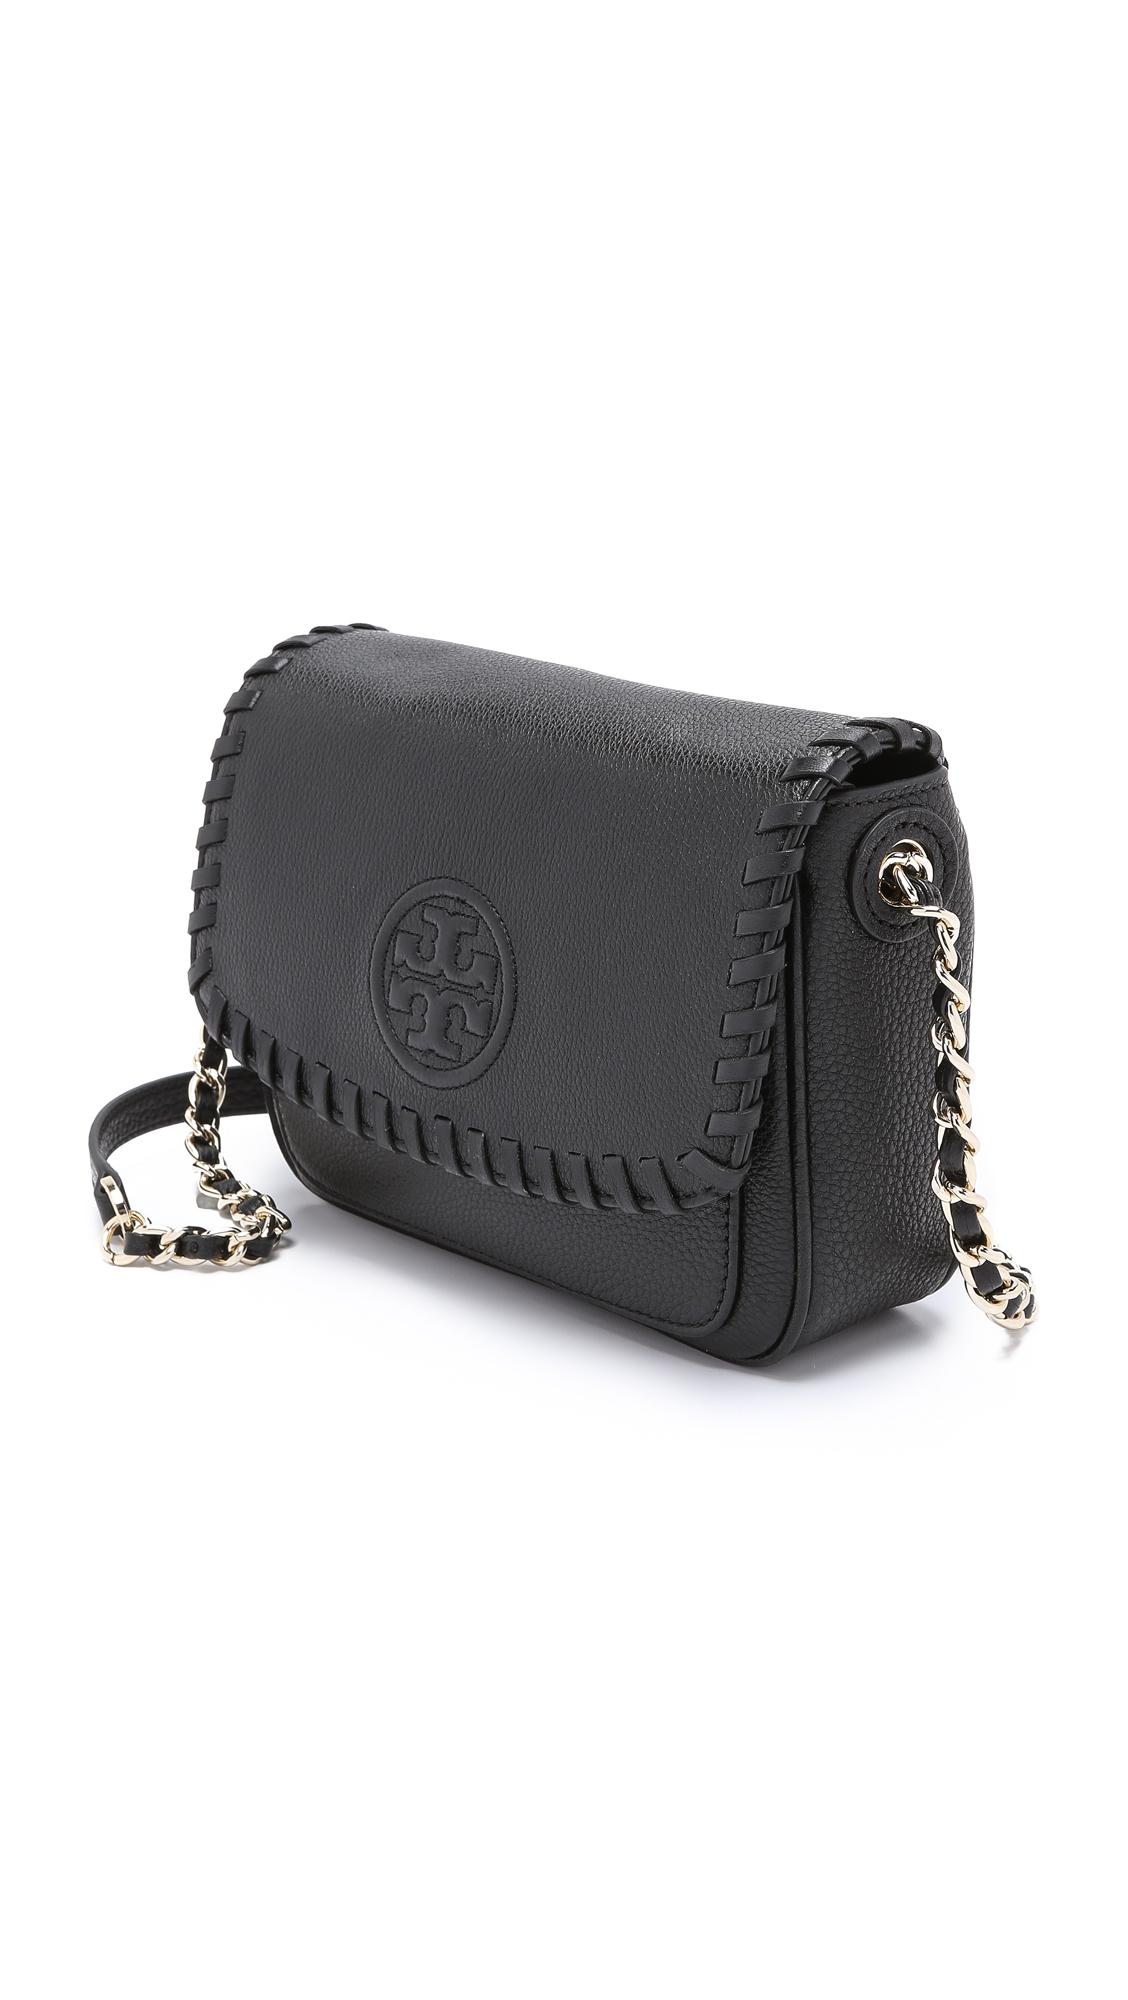 5a1eeed7fe Tory Burch Marion Mini Bag | SHOPBOP